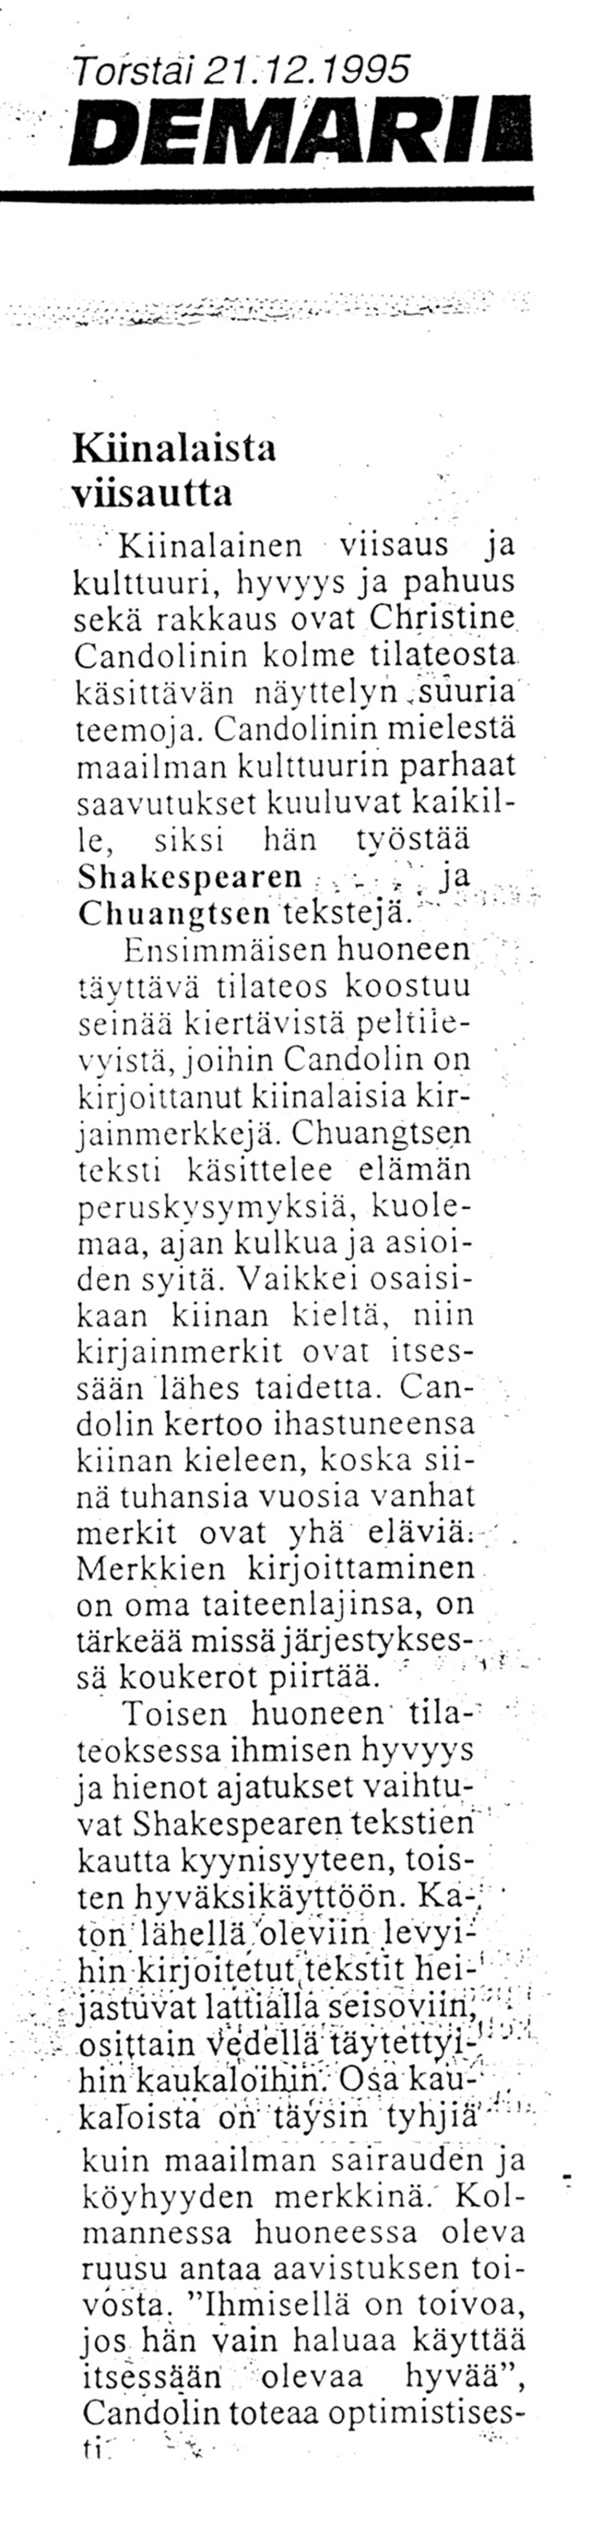 1995 Demari